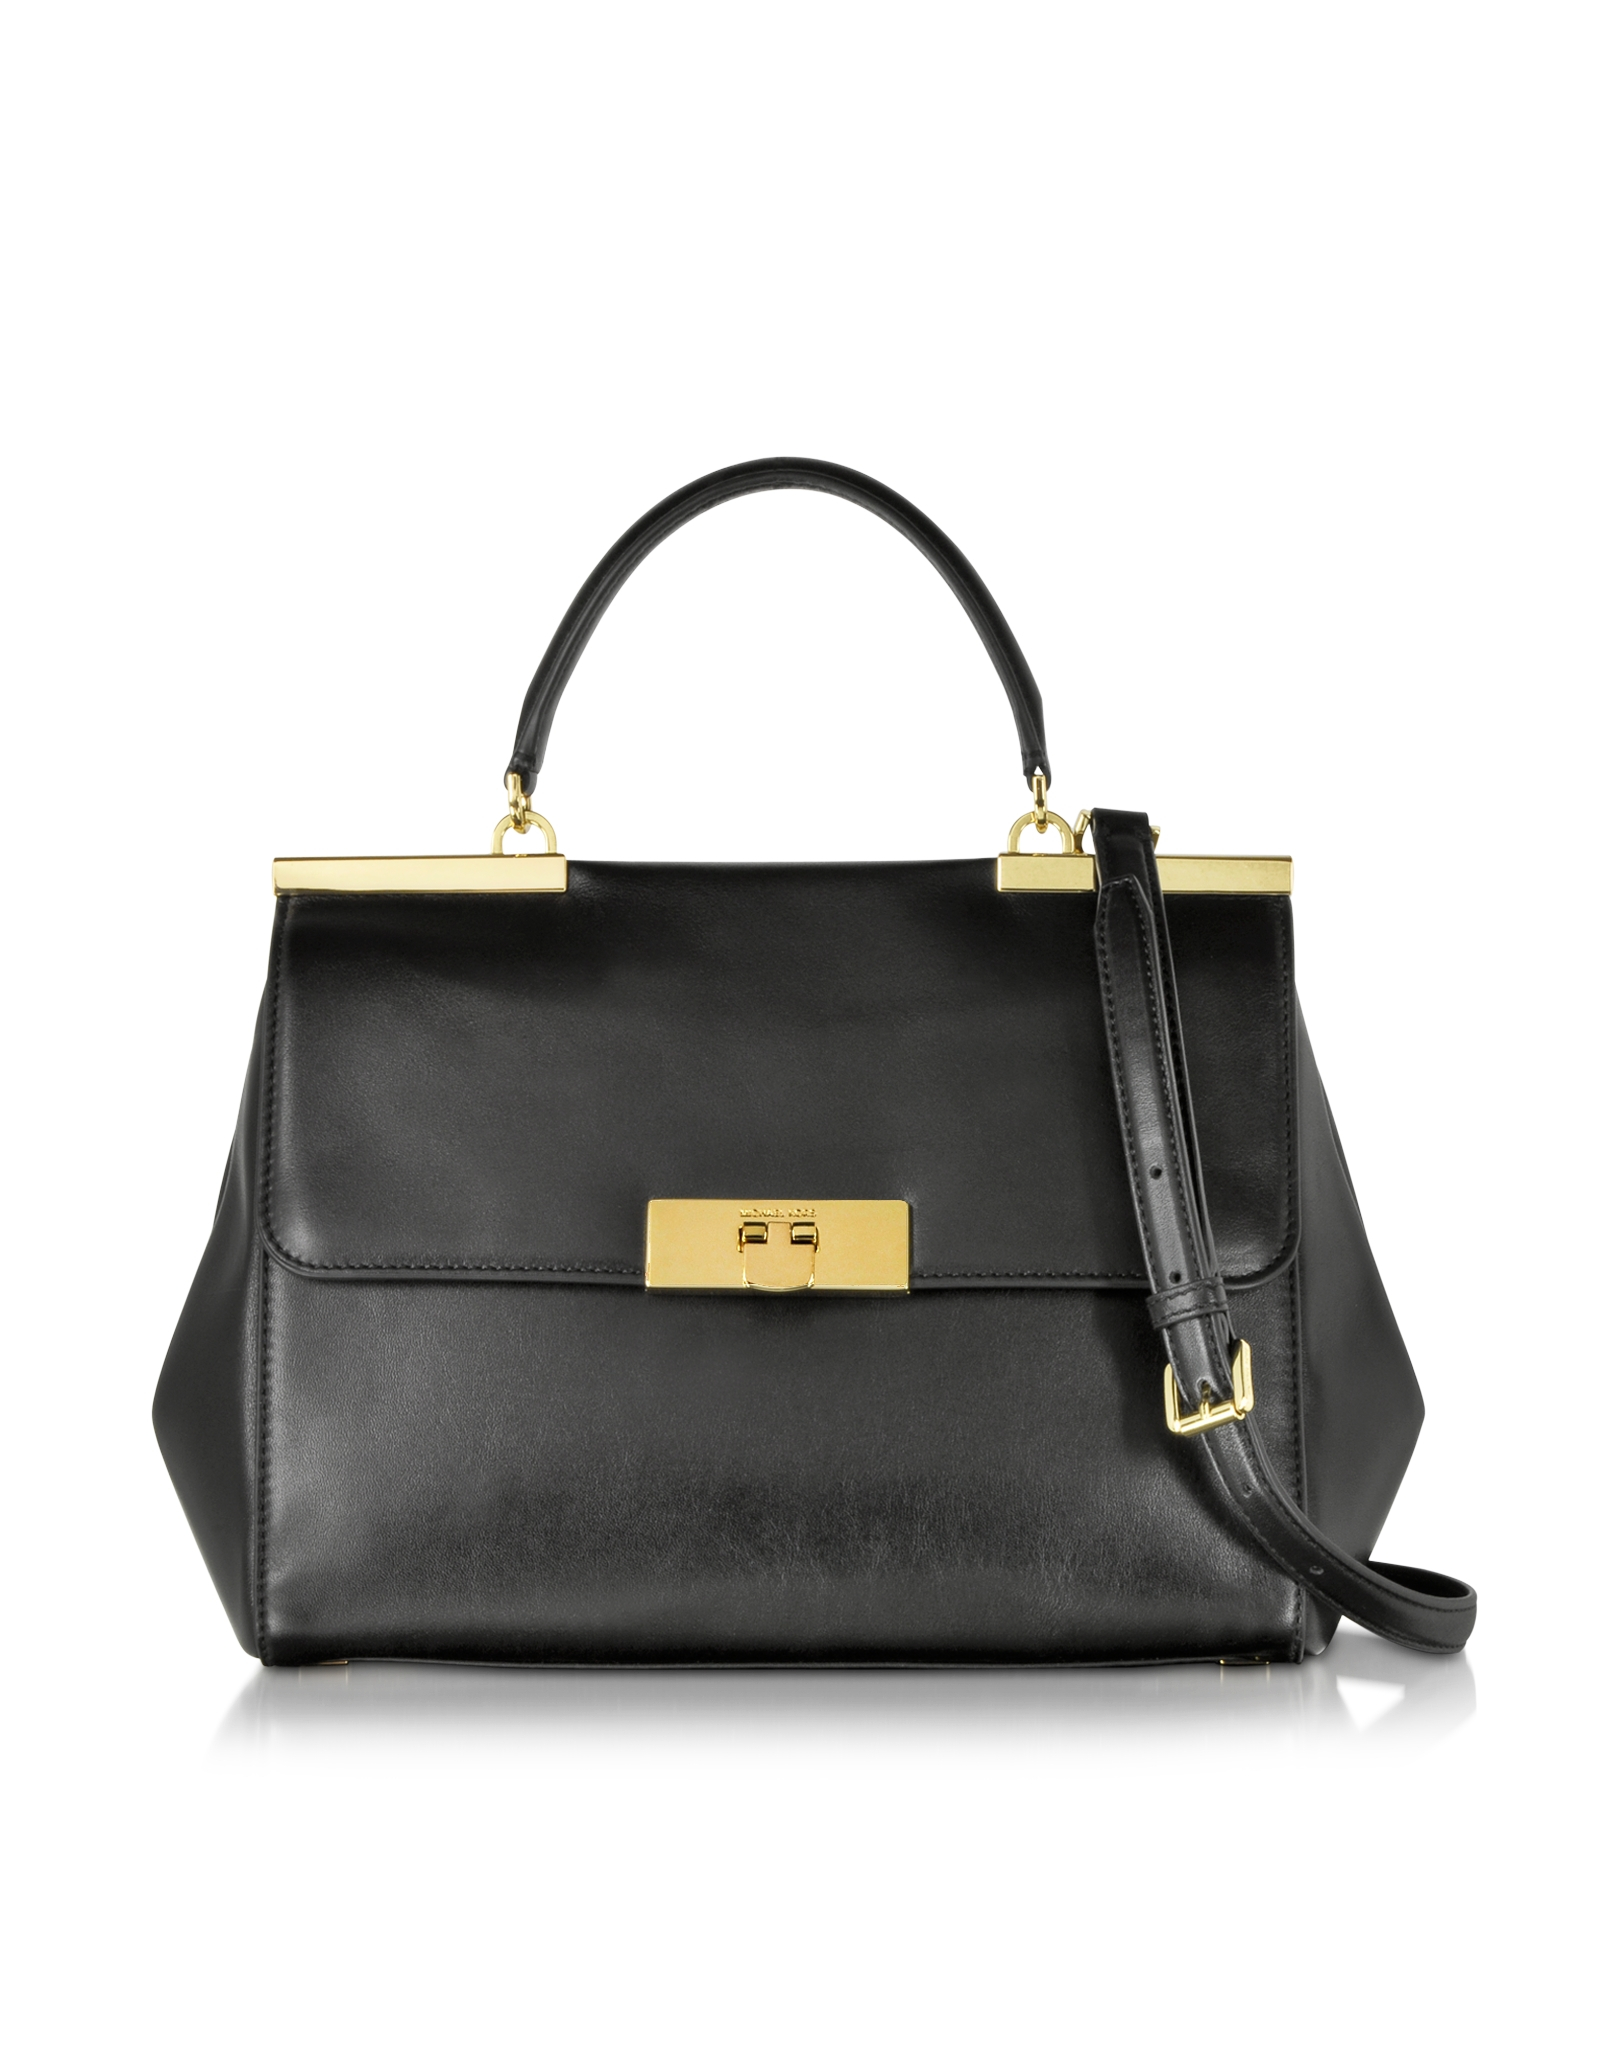 da9ce4135407 Michael Kors Marlow Large Leather Satchel Bag in Black - Lyst